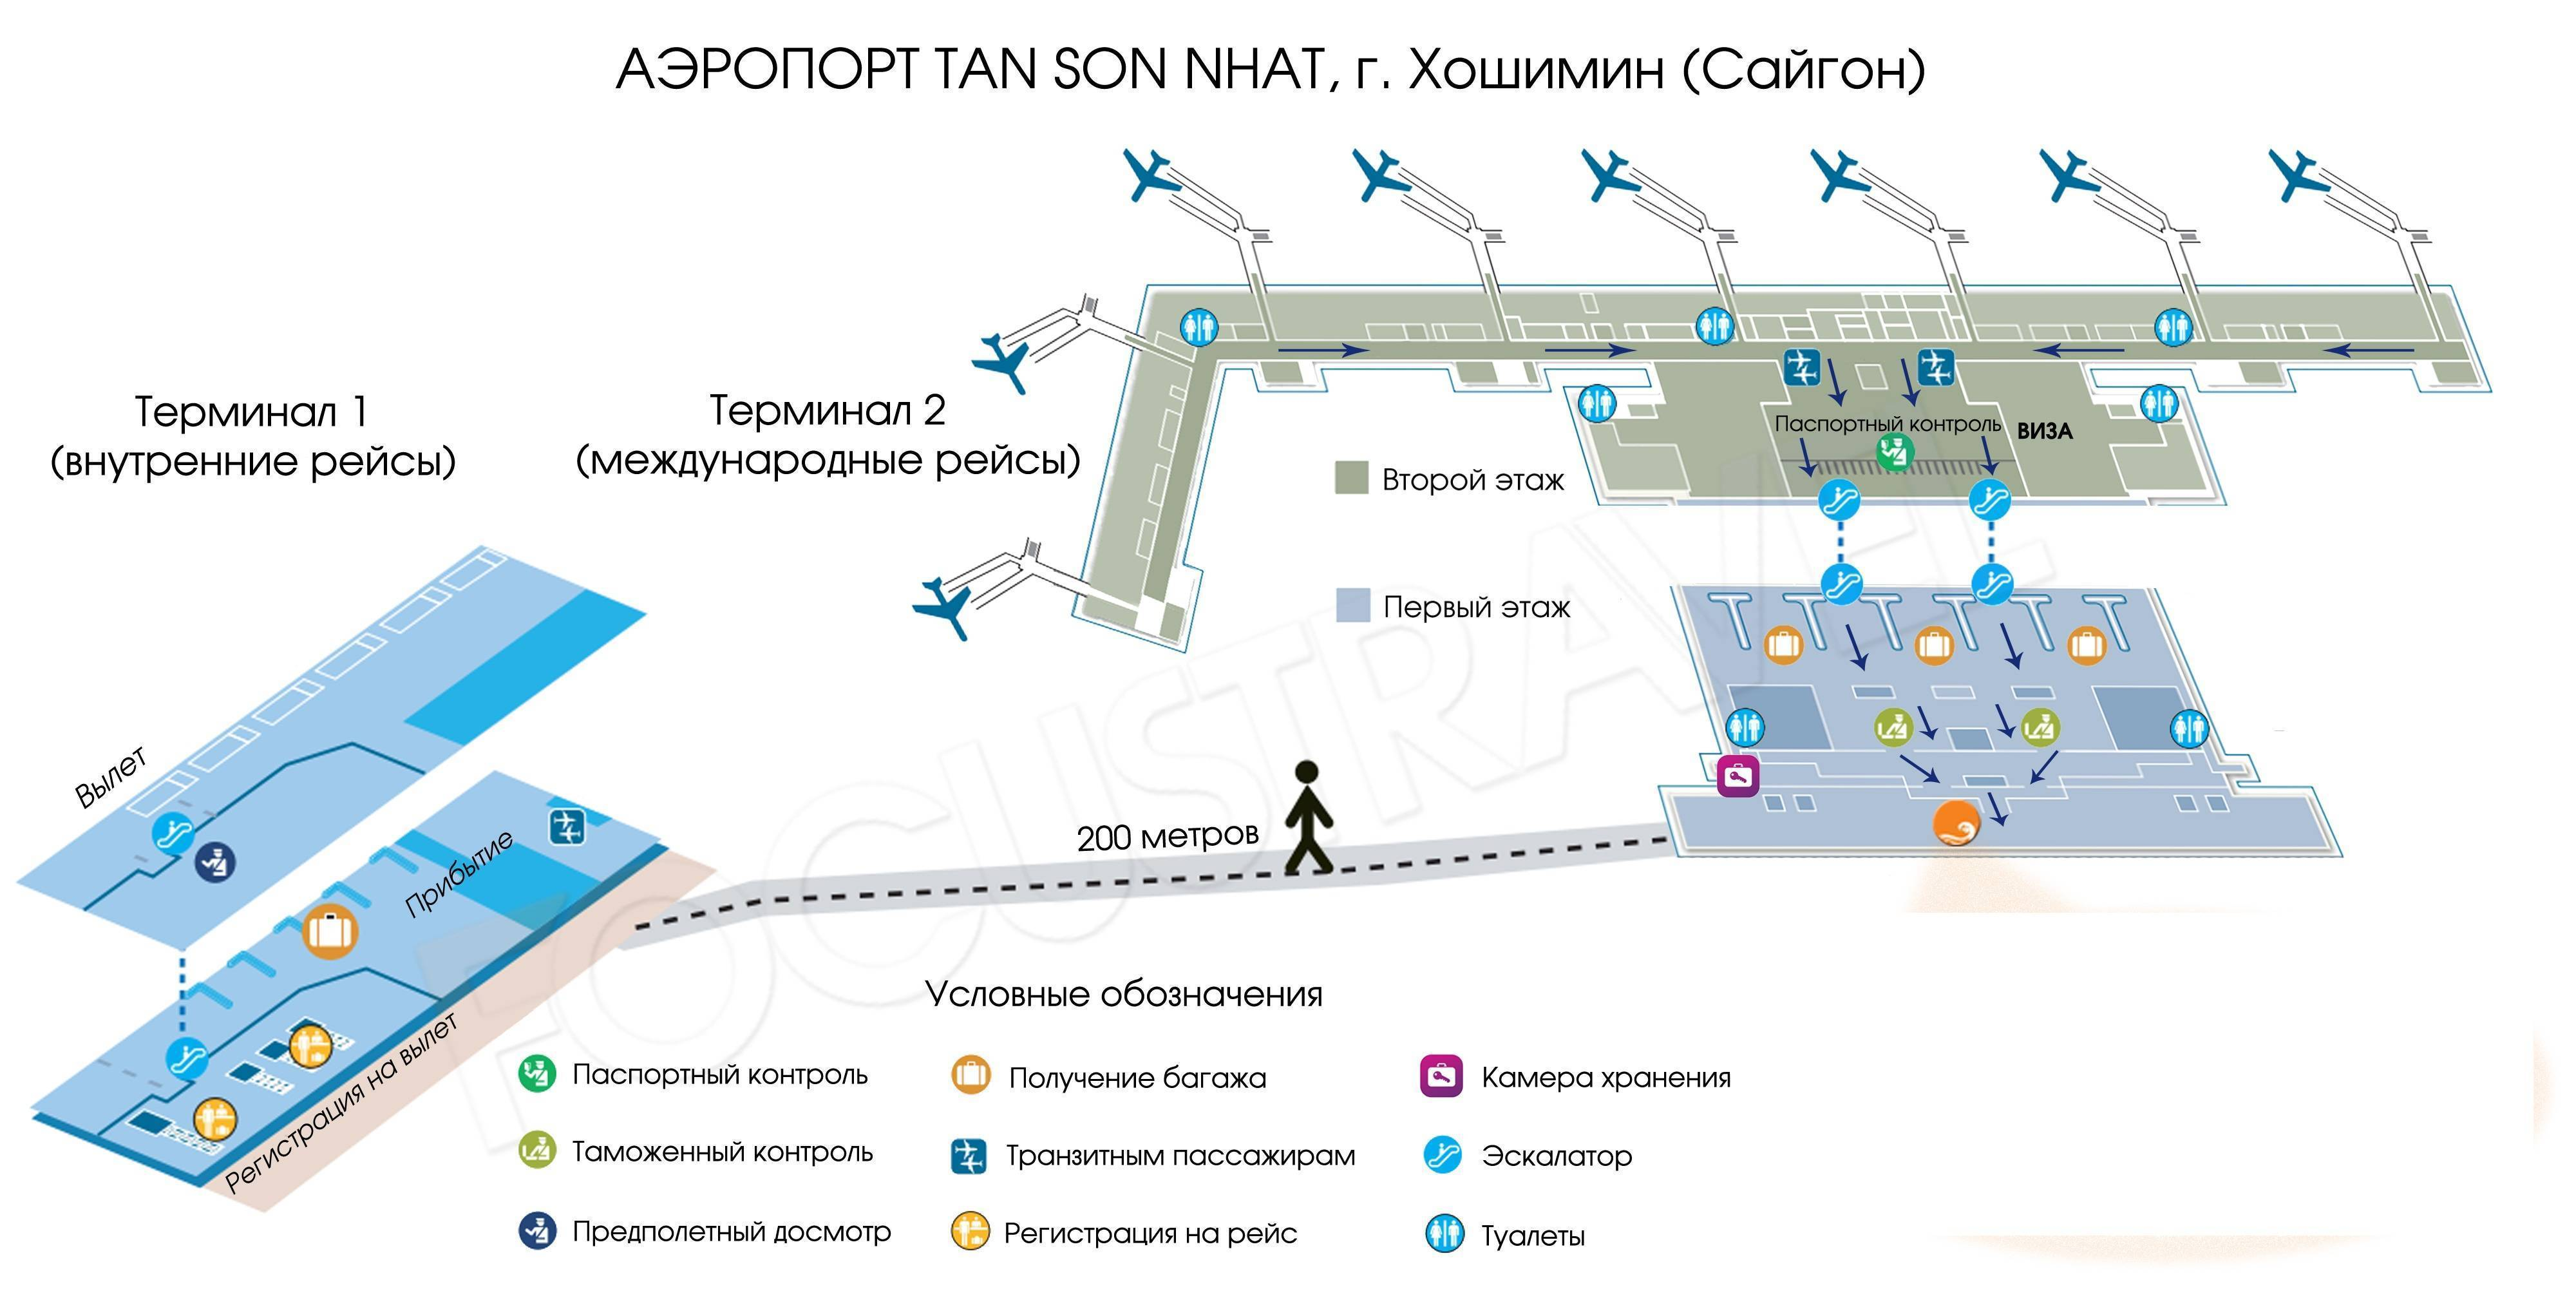 Аэропорт бильбао (bilbao airport). официальный сайт.